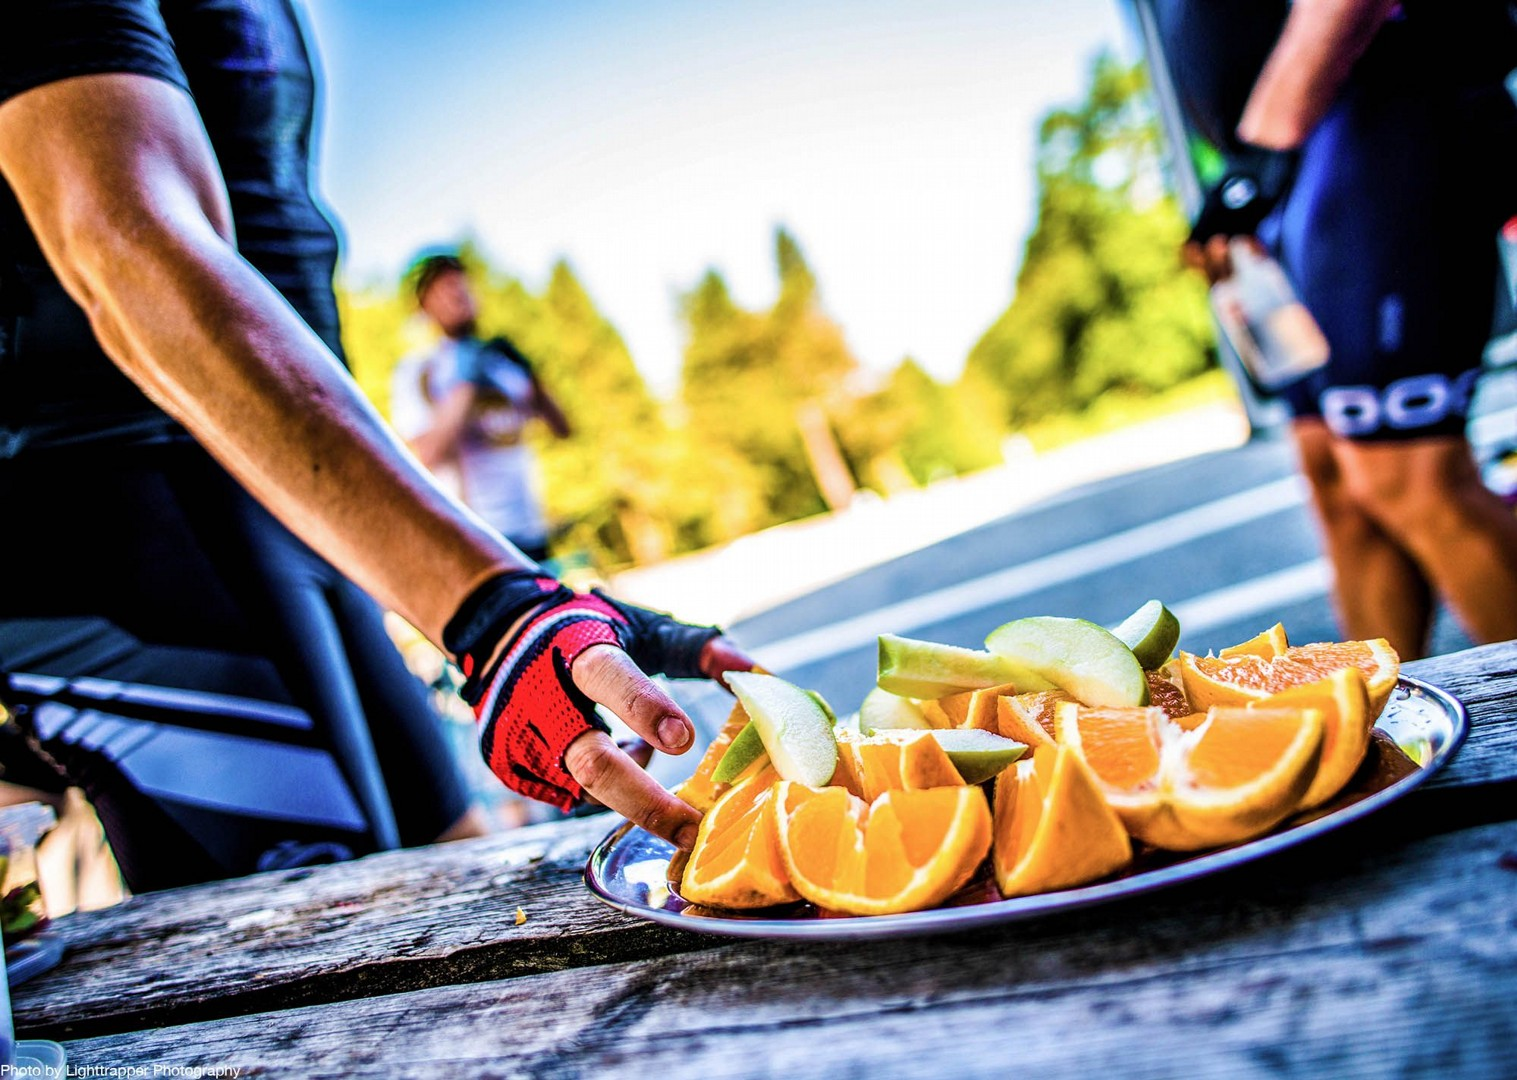 cycling-food-bike-road-guided-saddle-skedaddle-pyrenees.jpg - France - Pyrenees Fitness Week (Grade 3-4) - Guided Road Cycling Holiday - Road Cycling